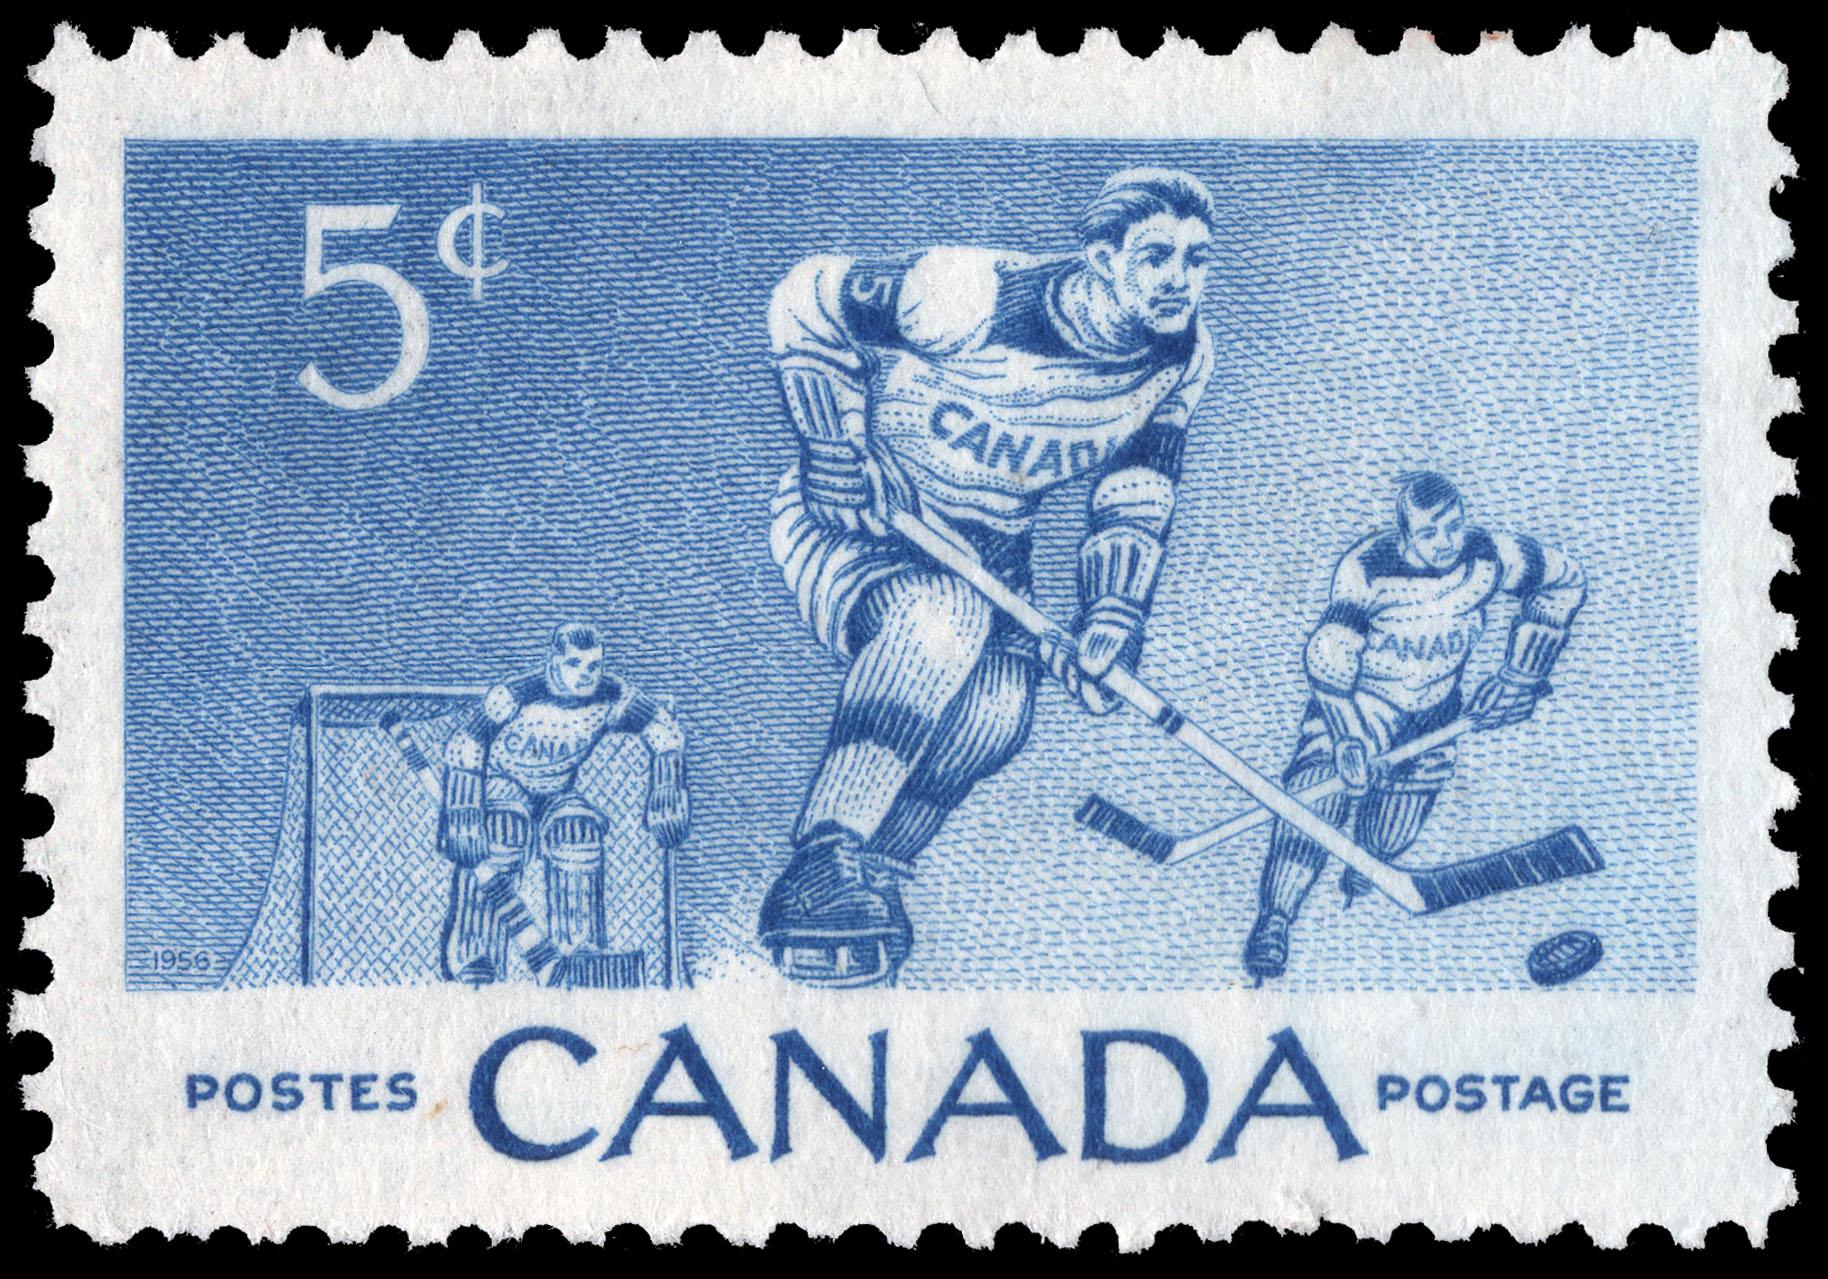 Hockey Canada Postage Stamp